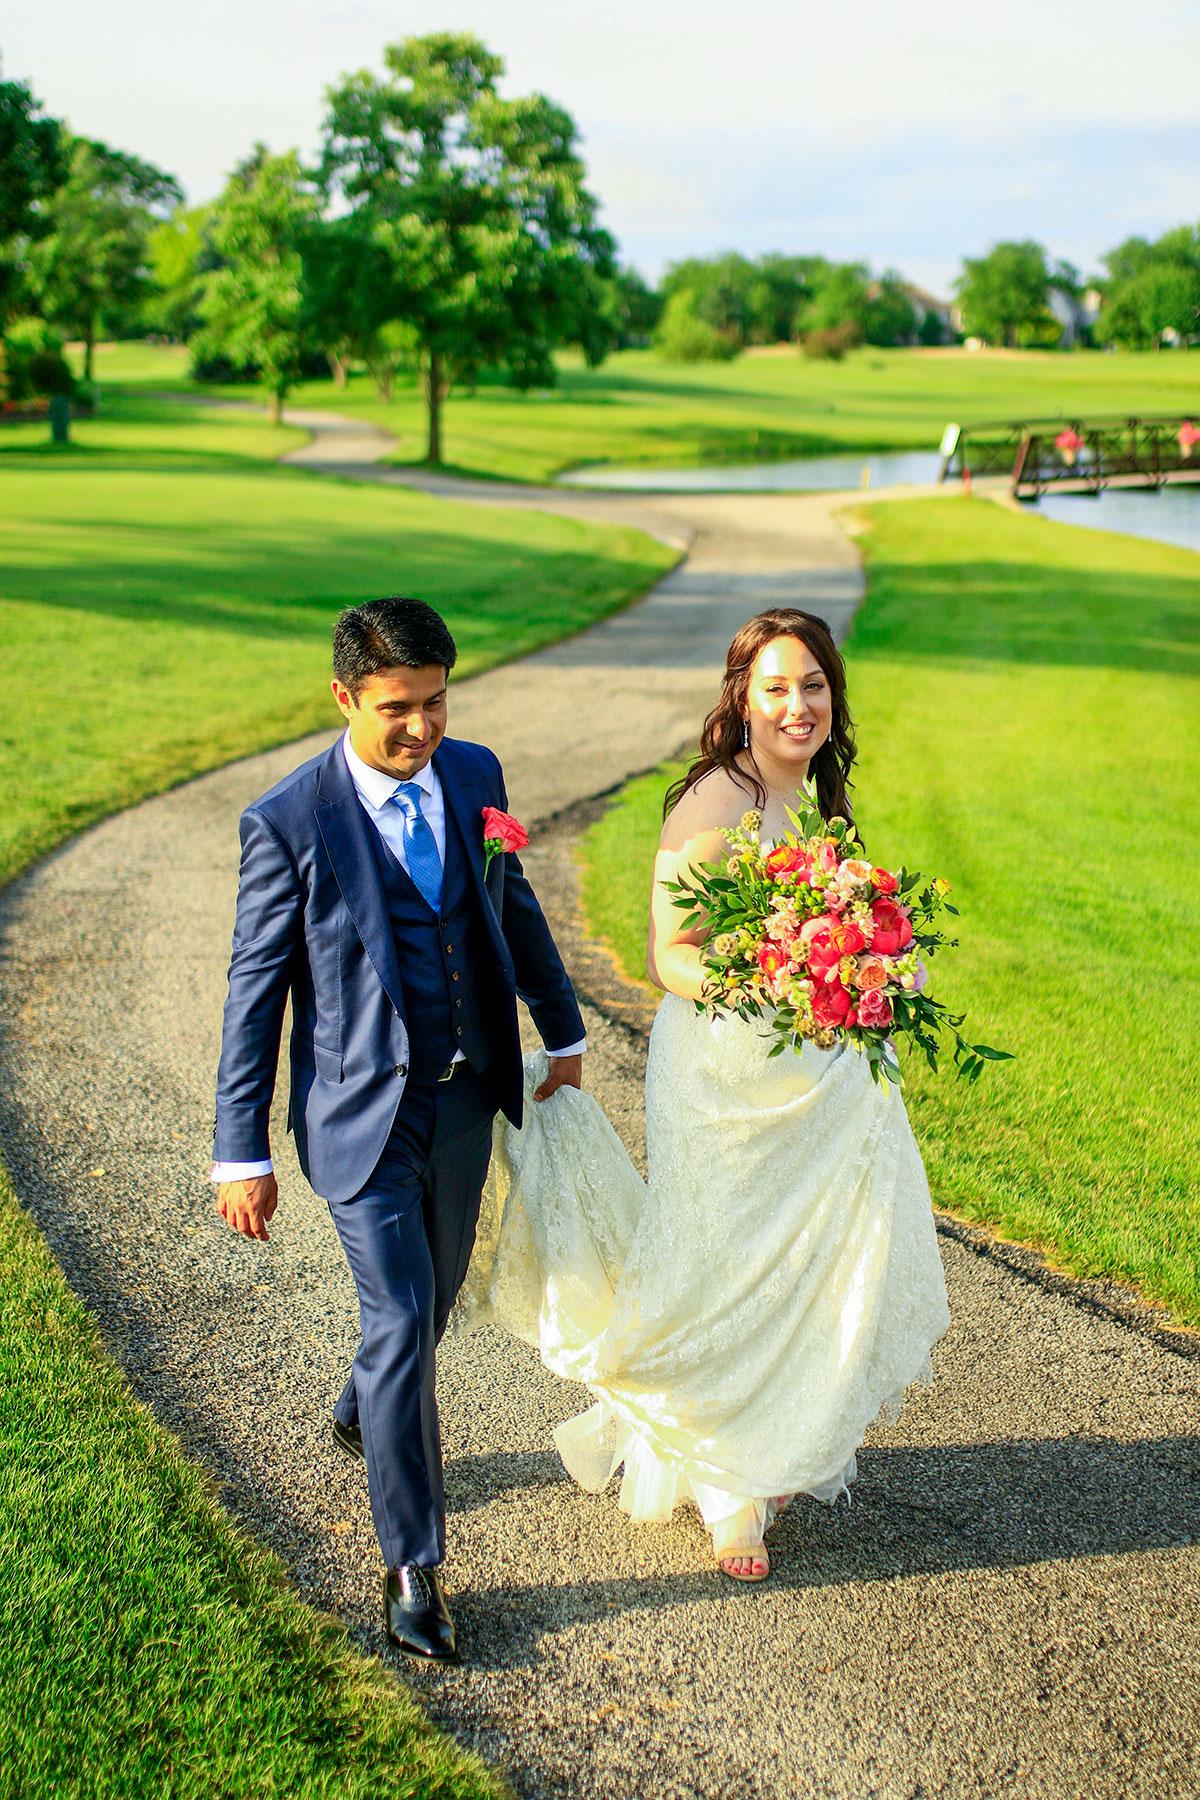 Wedding_Chicago_Anurag_Christine_13.JPG